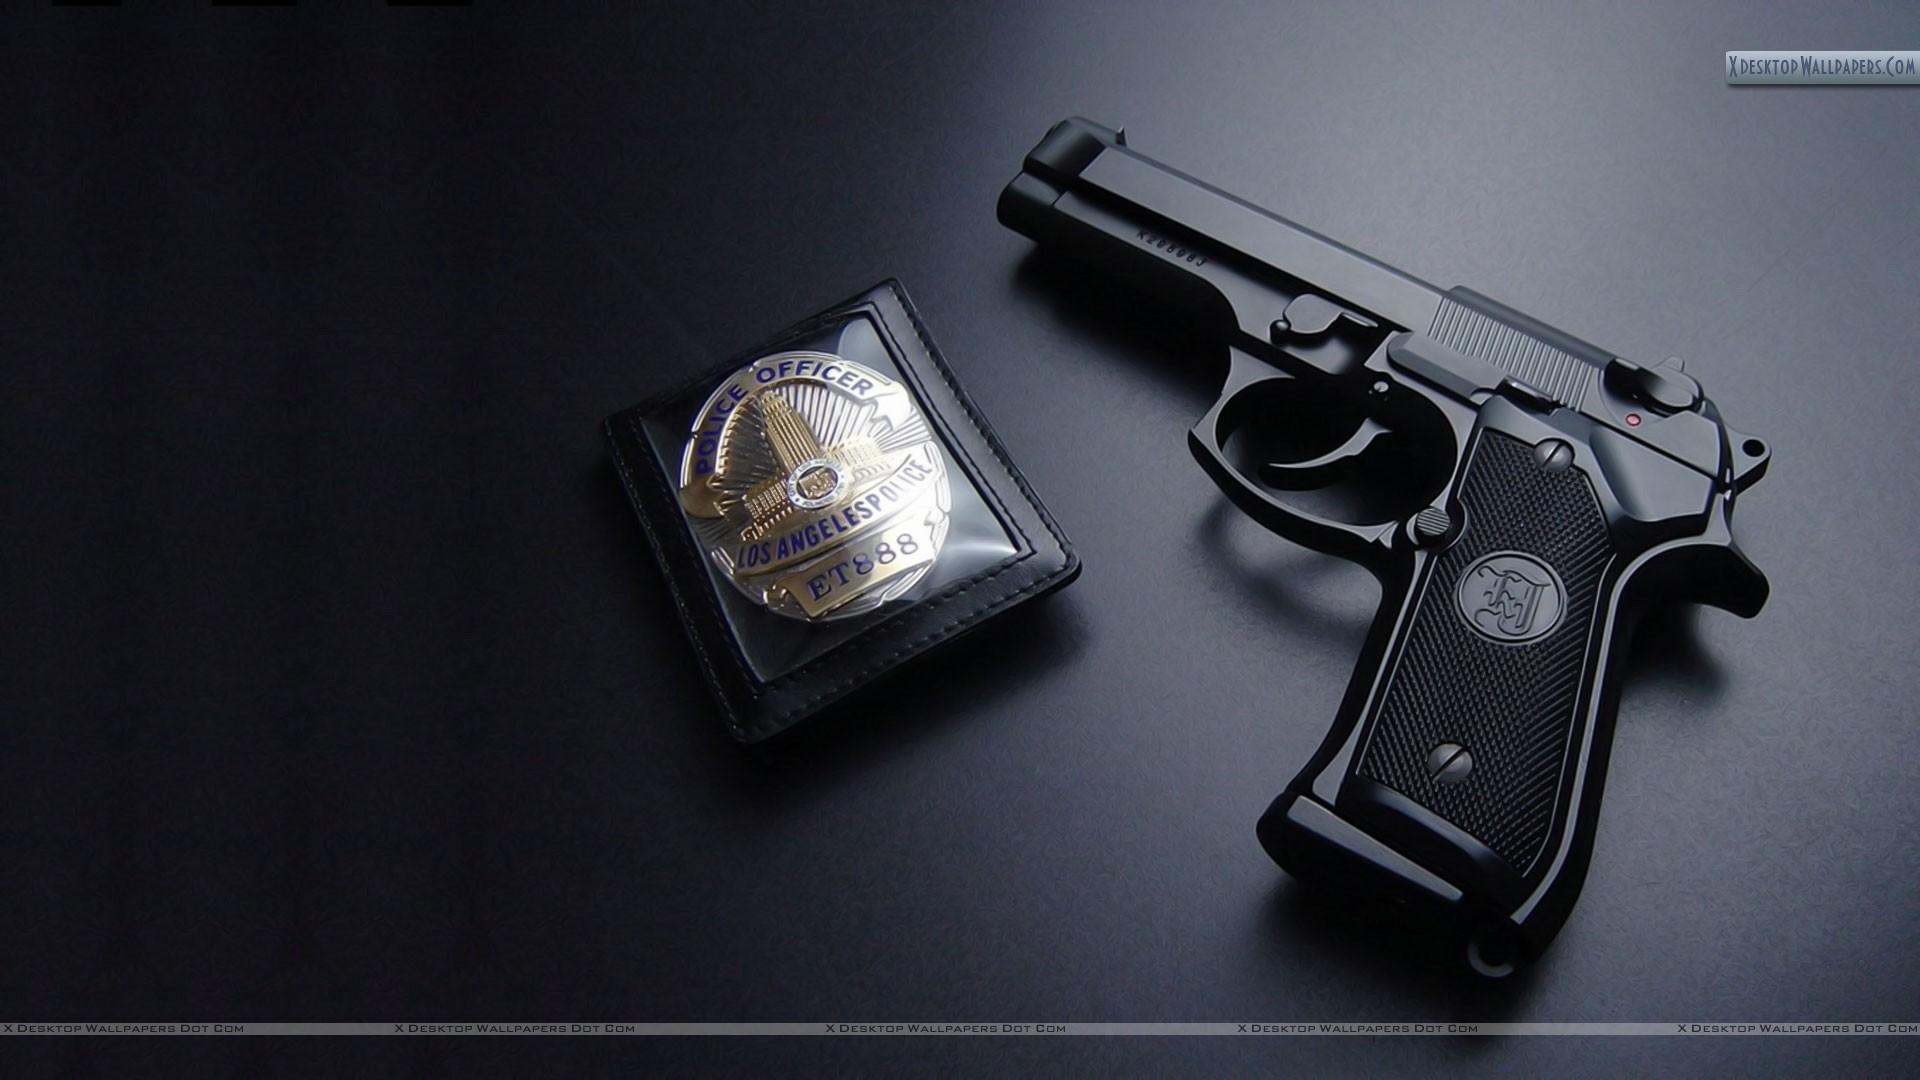 Los Angels Police Gun With Badge Wallpaper 1920x1080